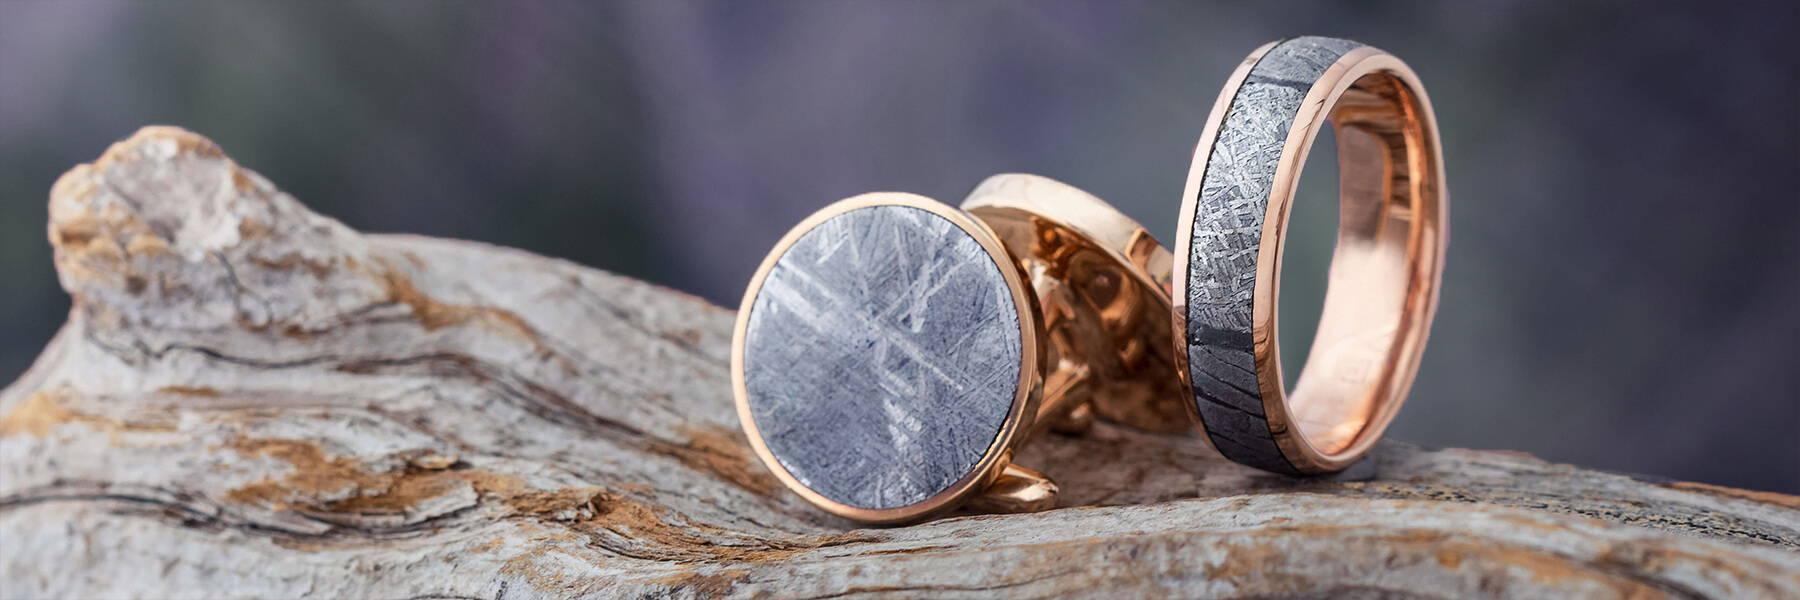 Rose Gold Meteorite Jewelry